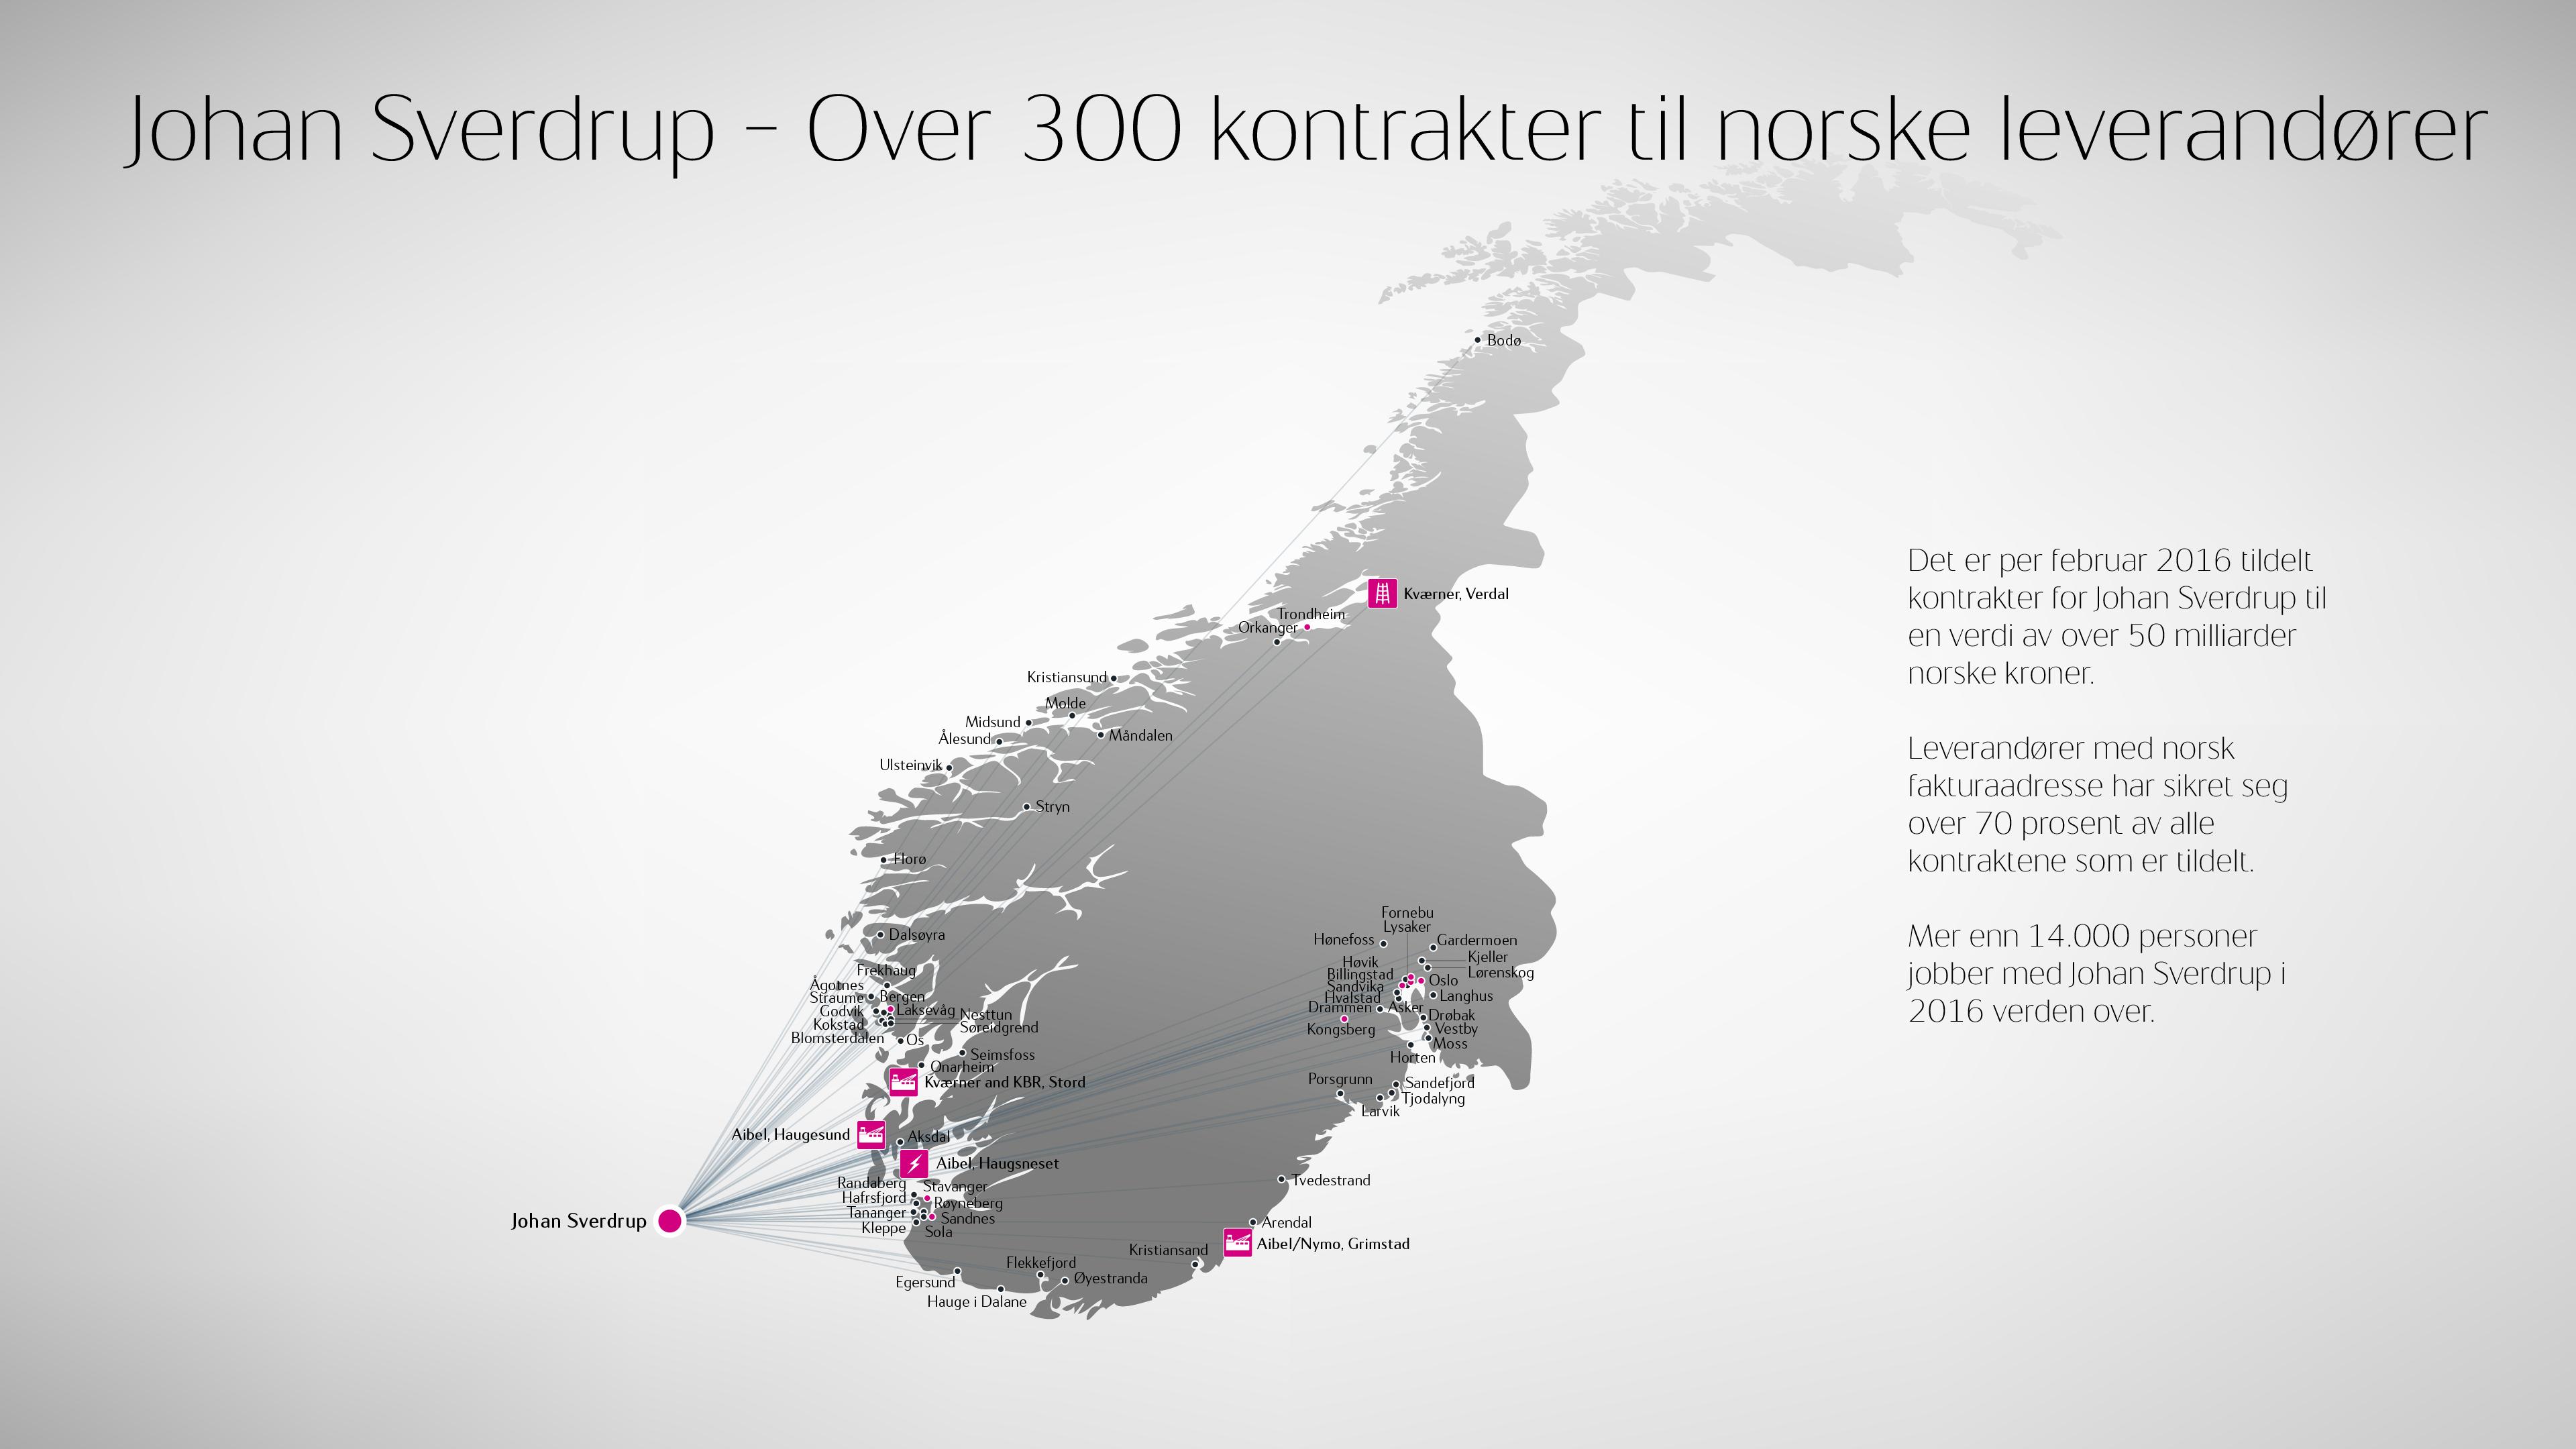 kart mongstad Johan Sverdrup: Contract for Mongstad terminal upgrade   equinor.com kart mongstad